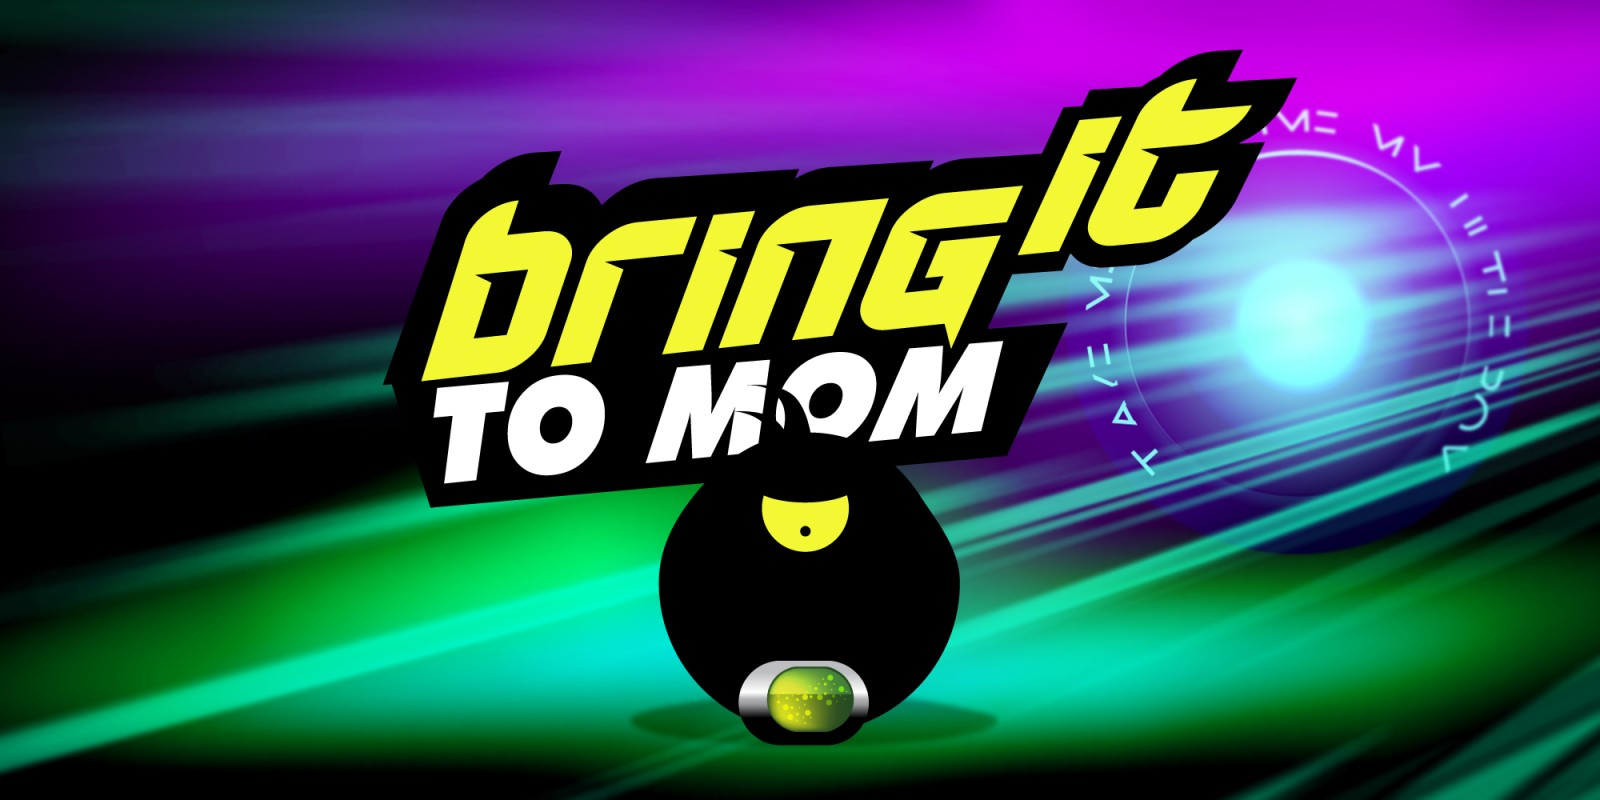 BringIt to MOM